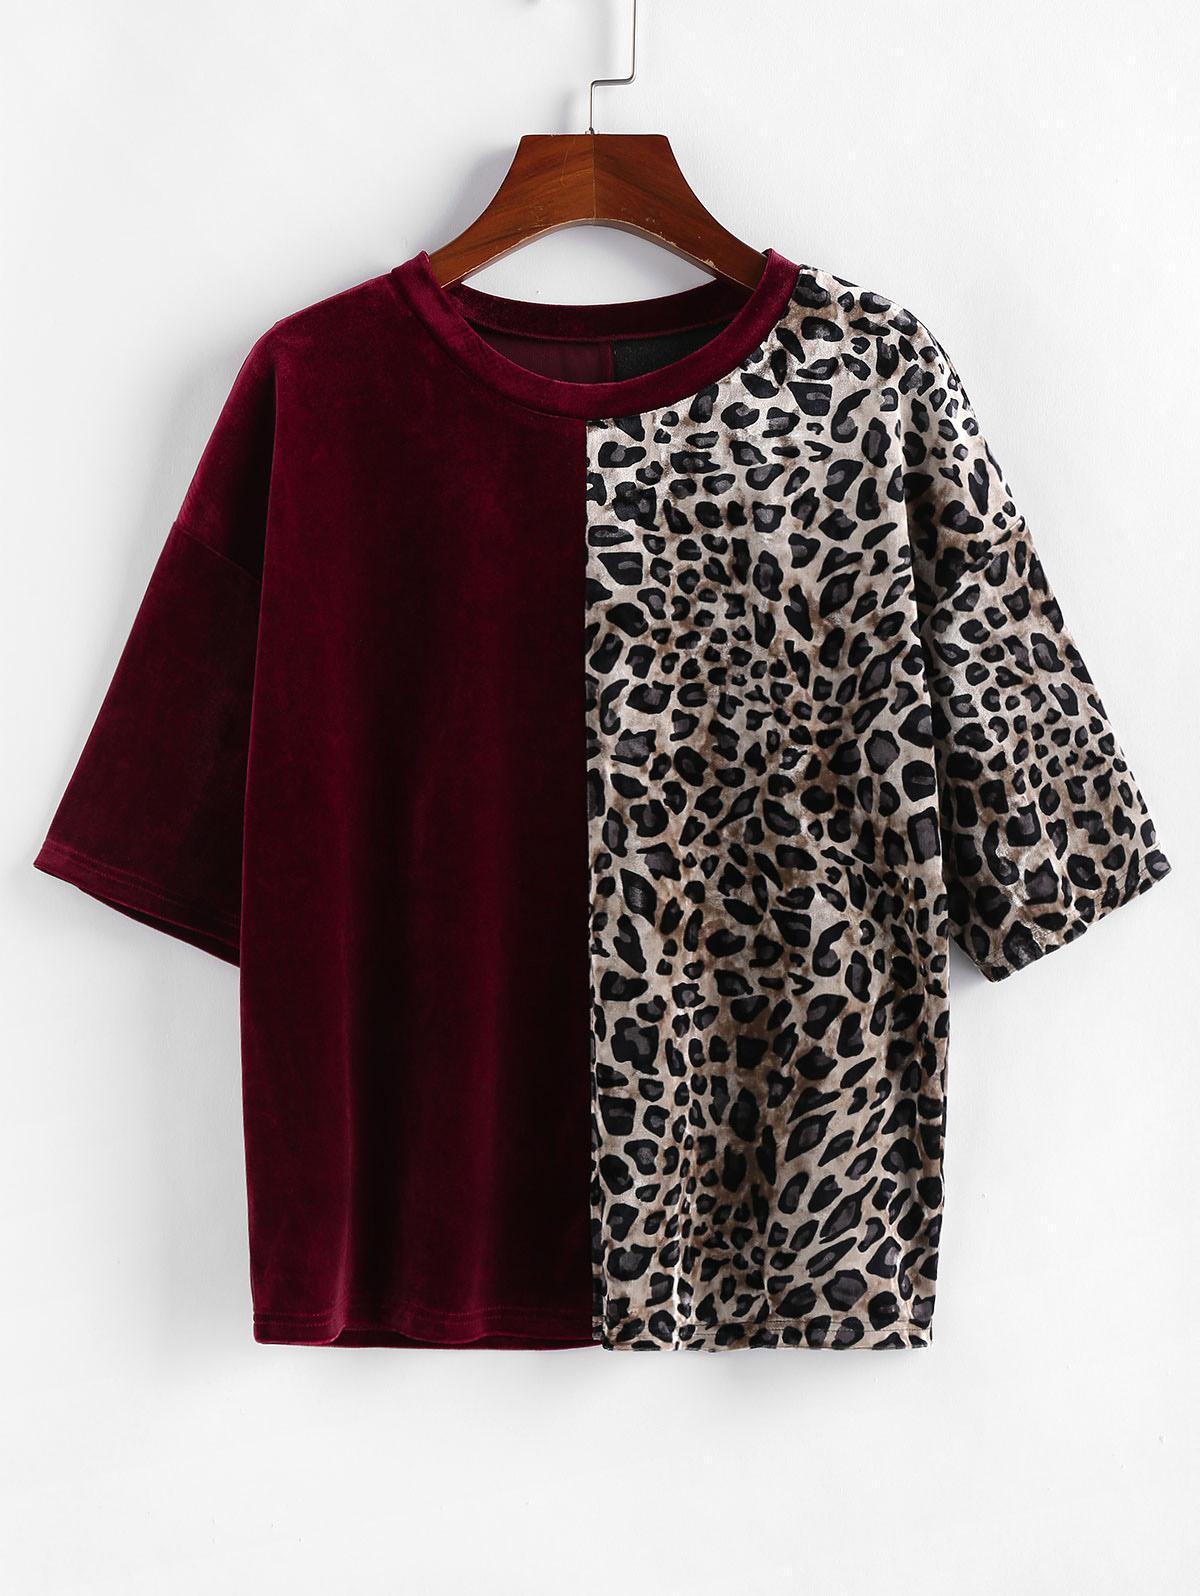 ZAFUL Velvet Leopard Print T Shirt фото